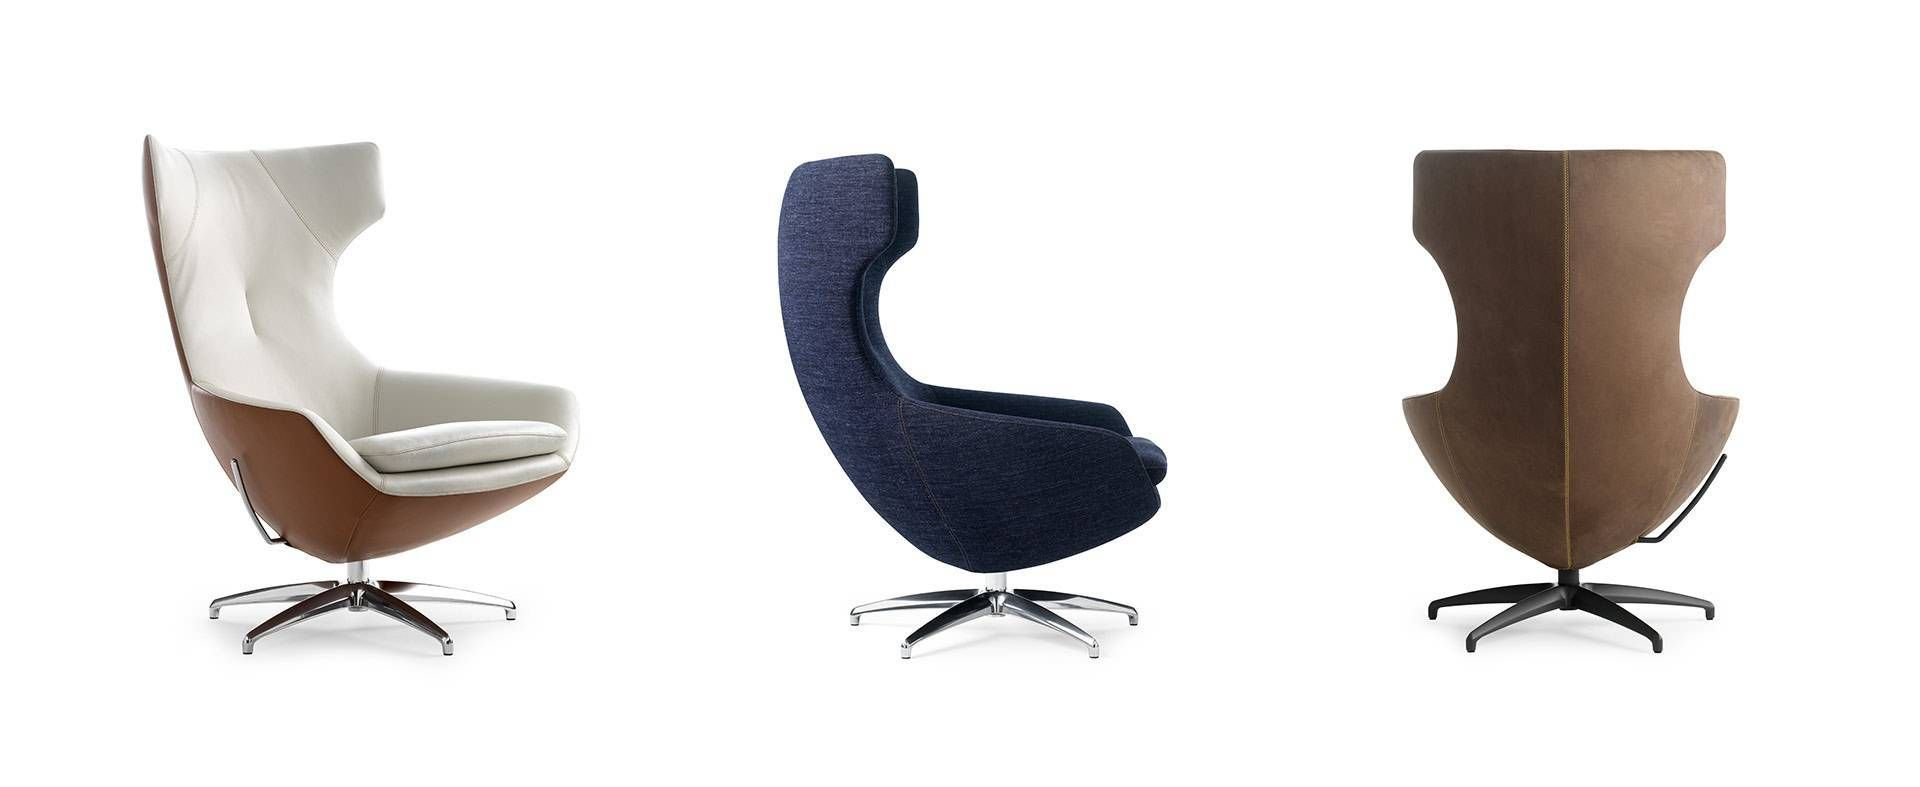 Leolux Relax Fauteuil.Design Fauteuil Caruzzo Van Leolux Woonkamer